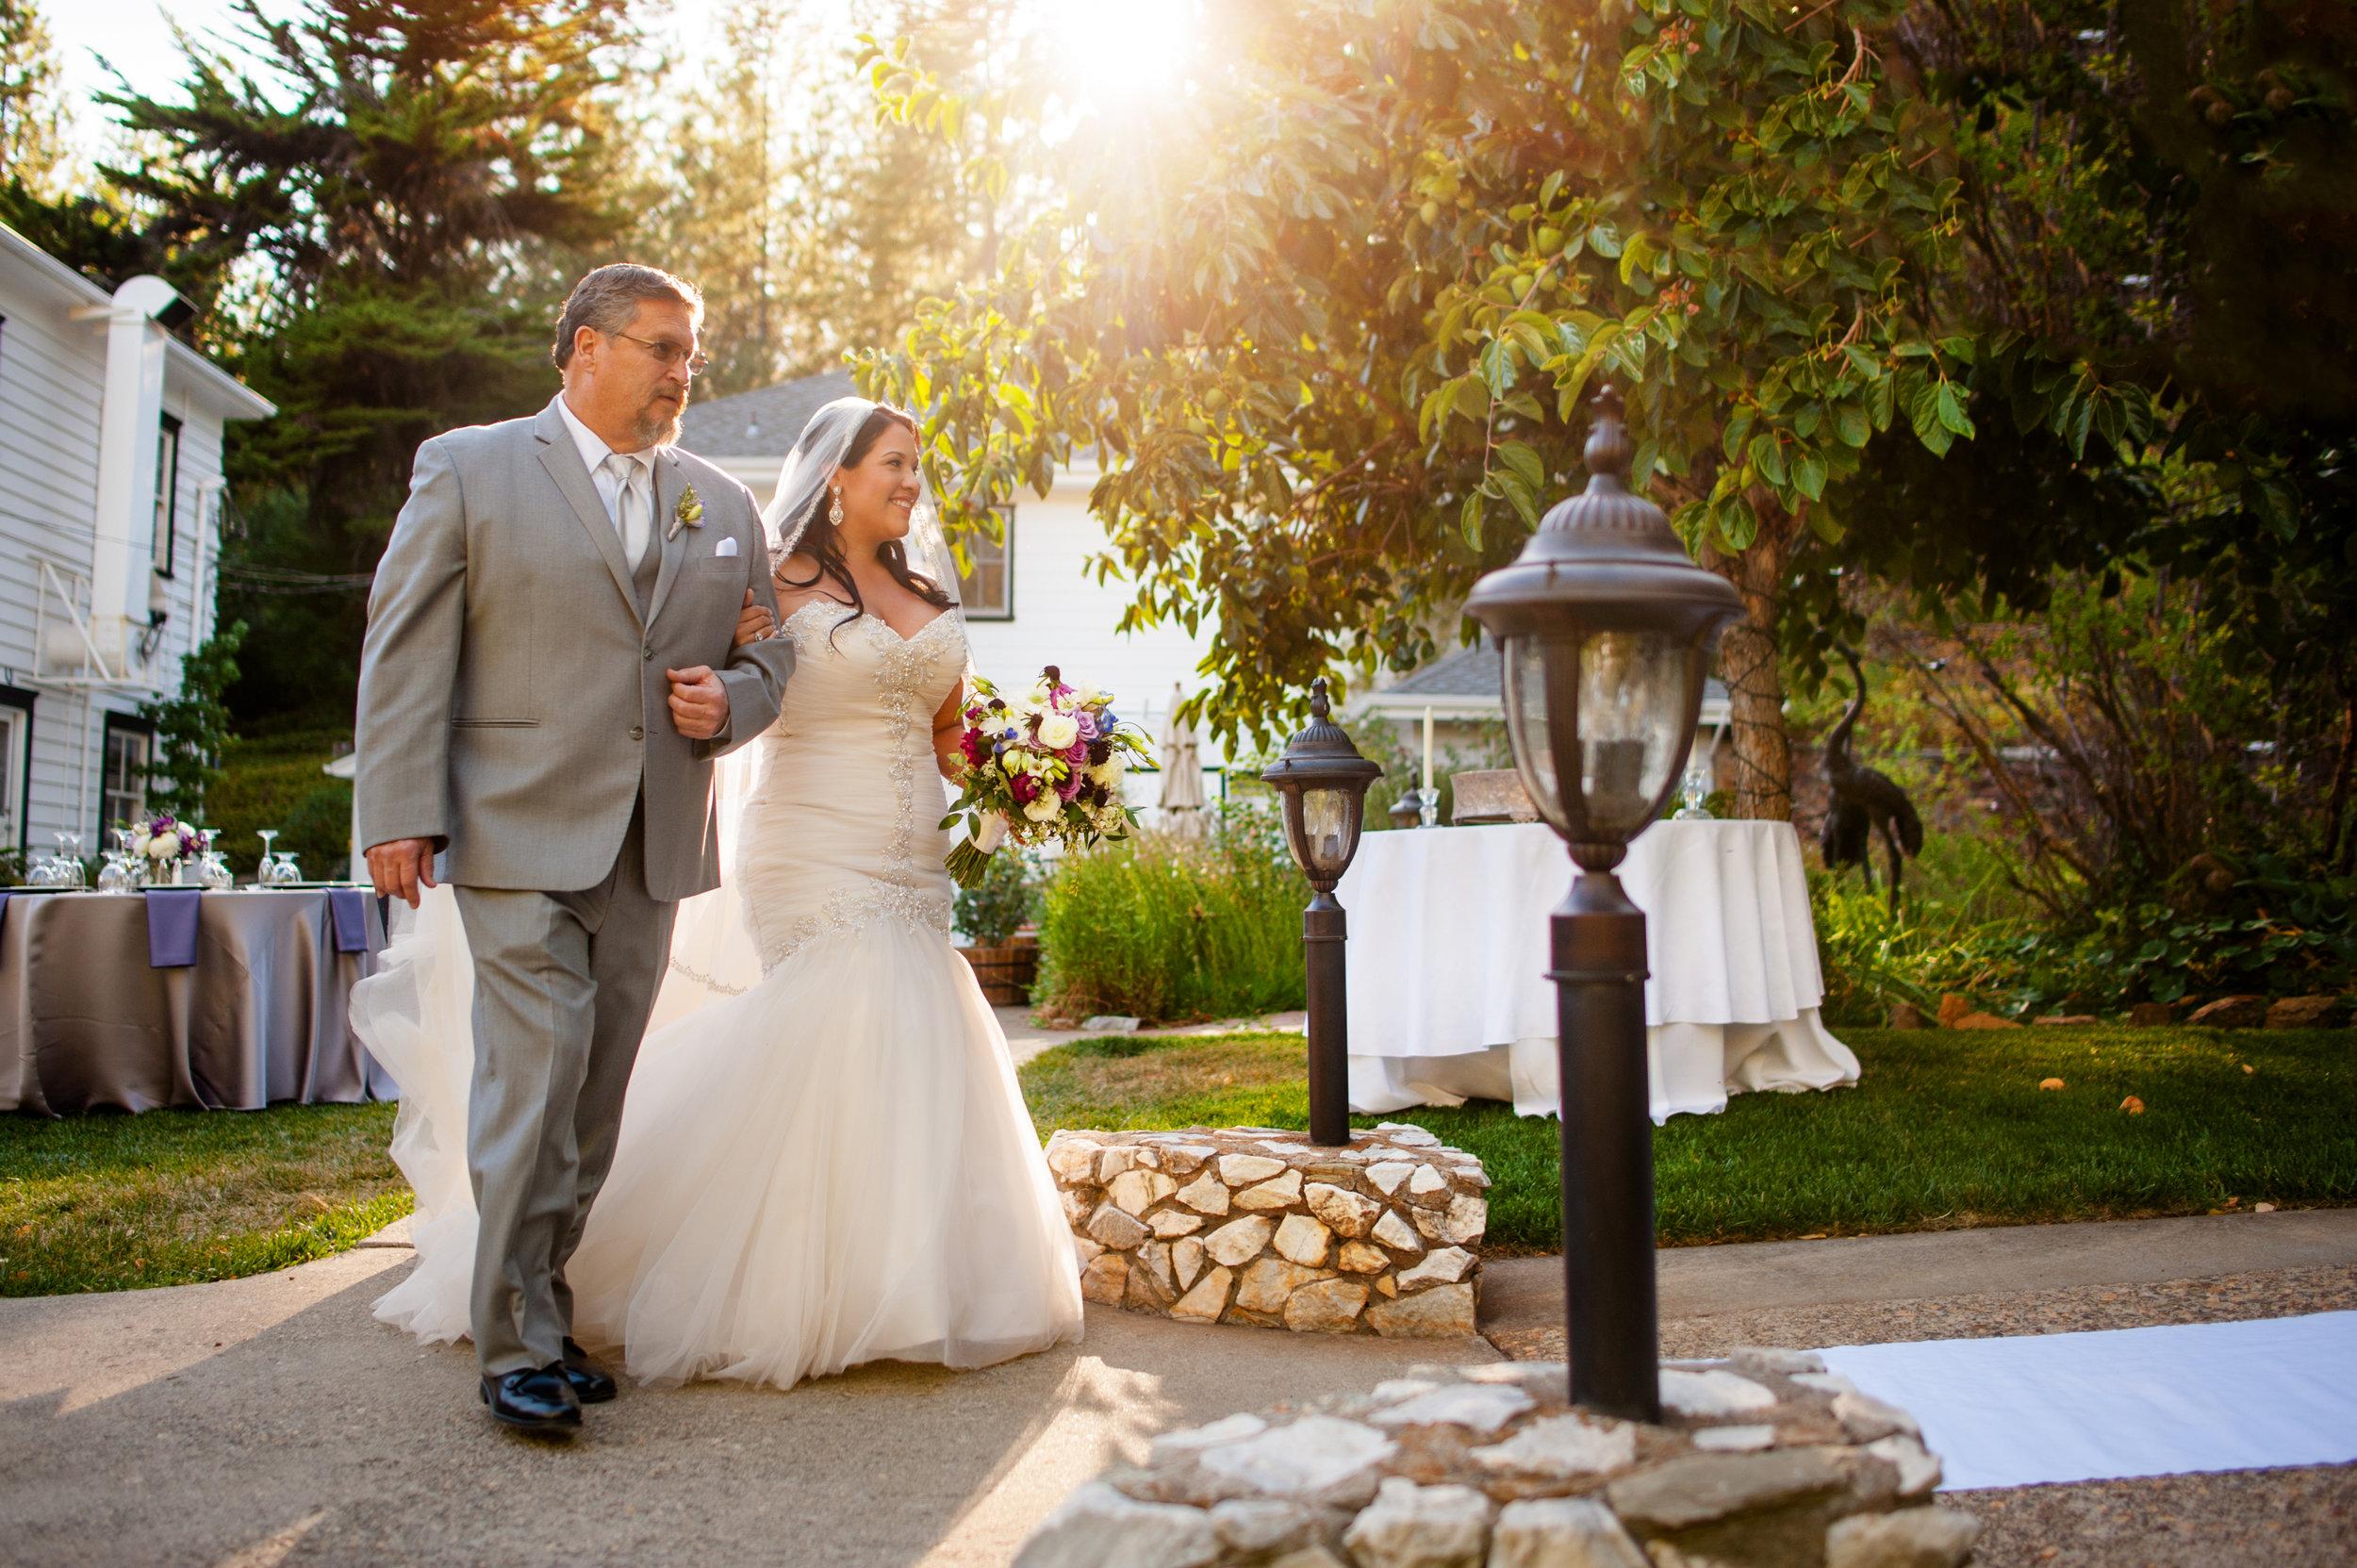 erika-seth-014-monte-verde-inn-sacramento-wedding-photographer-katherine-nicole-photography.JPG